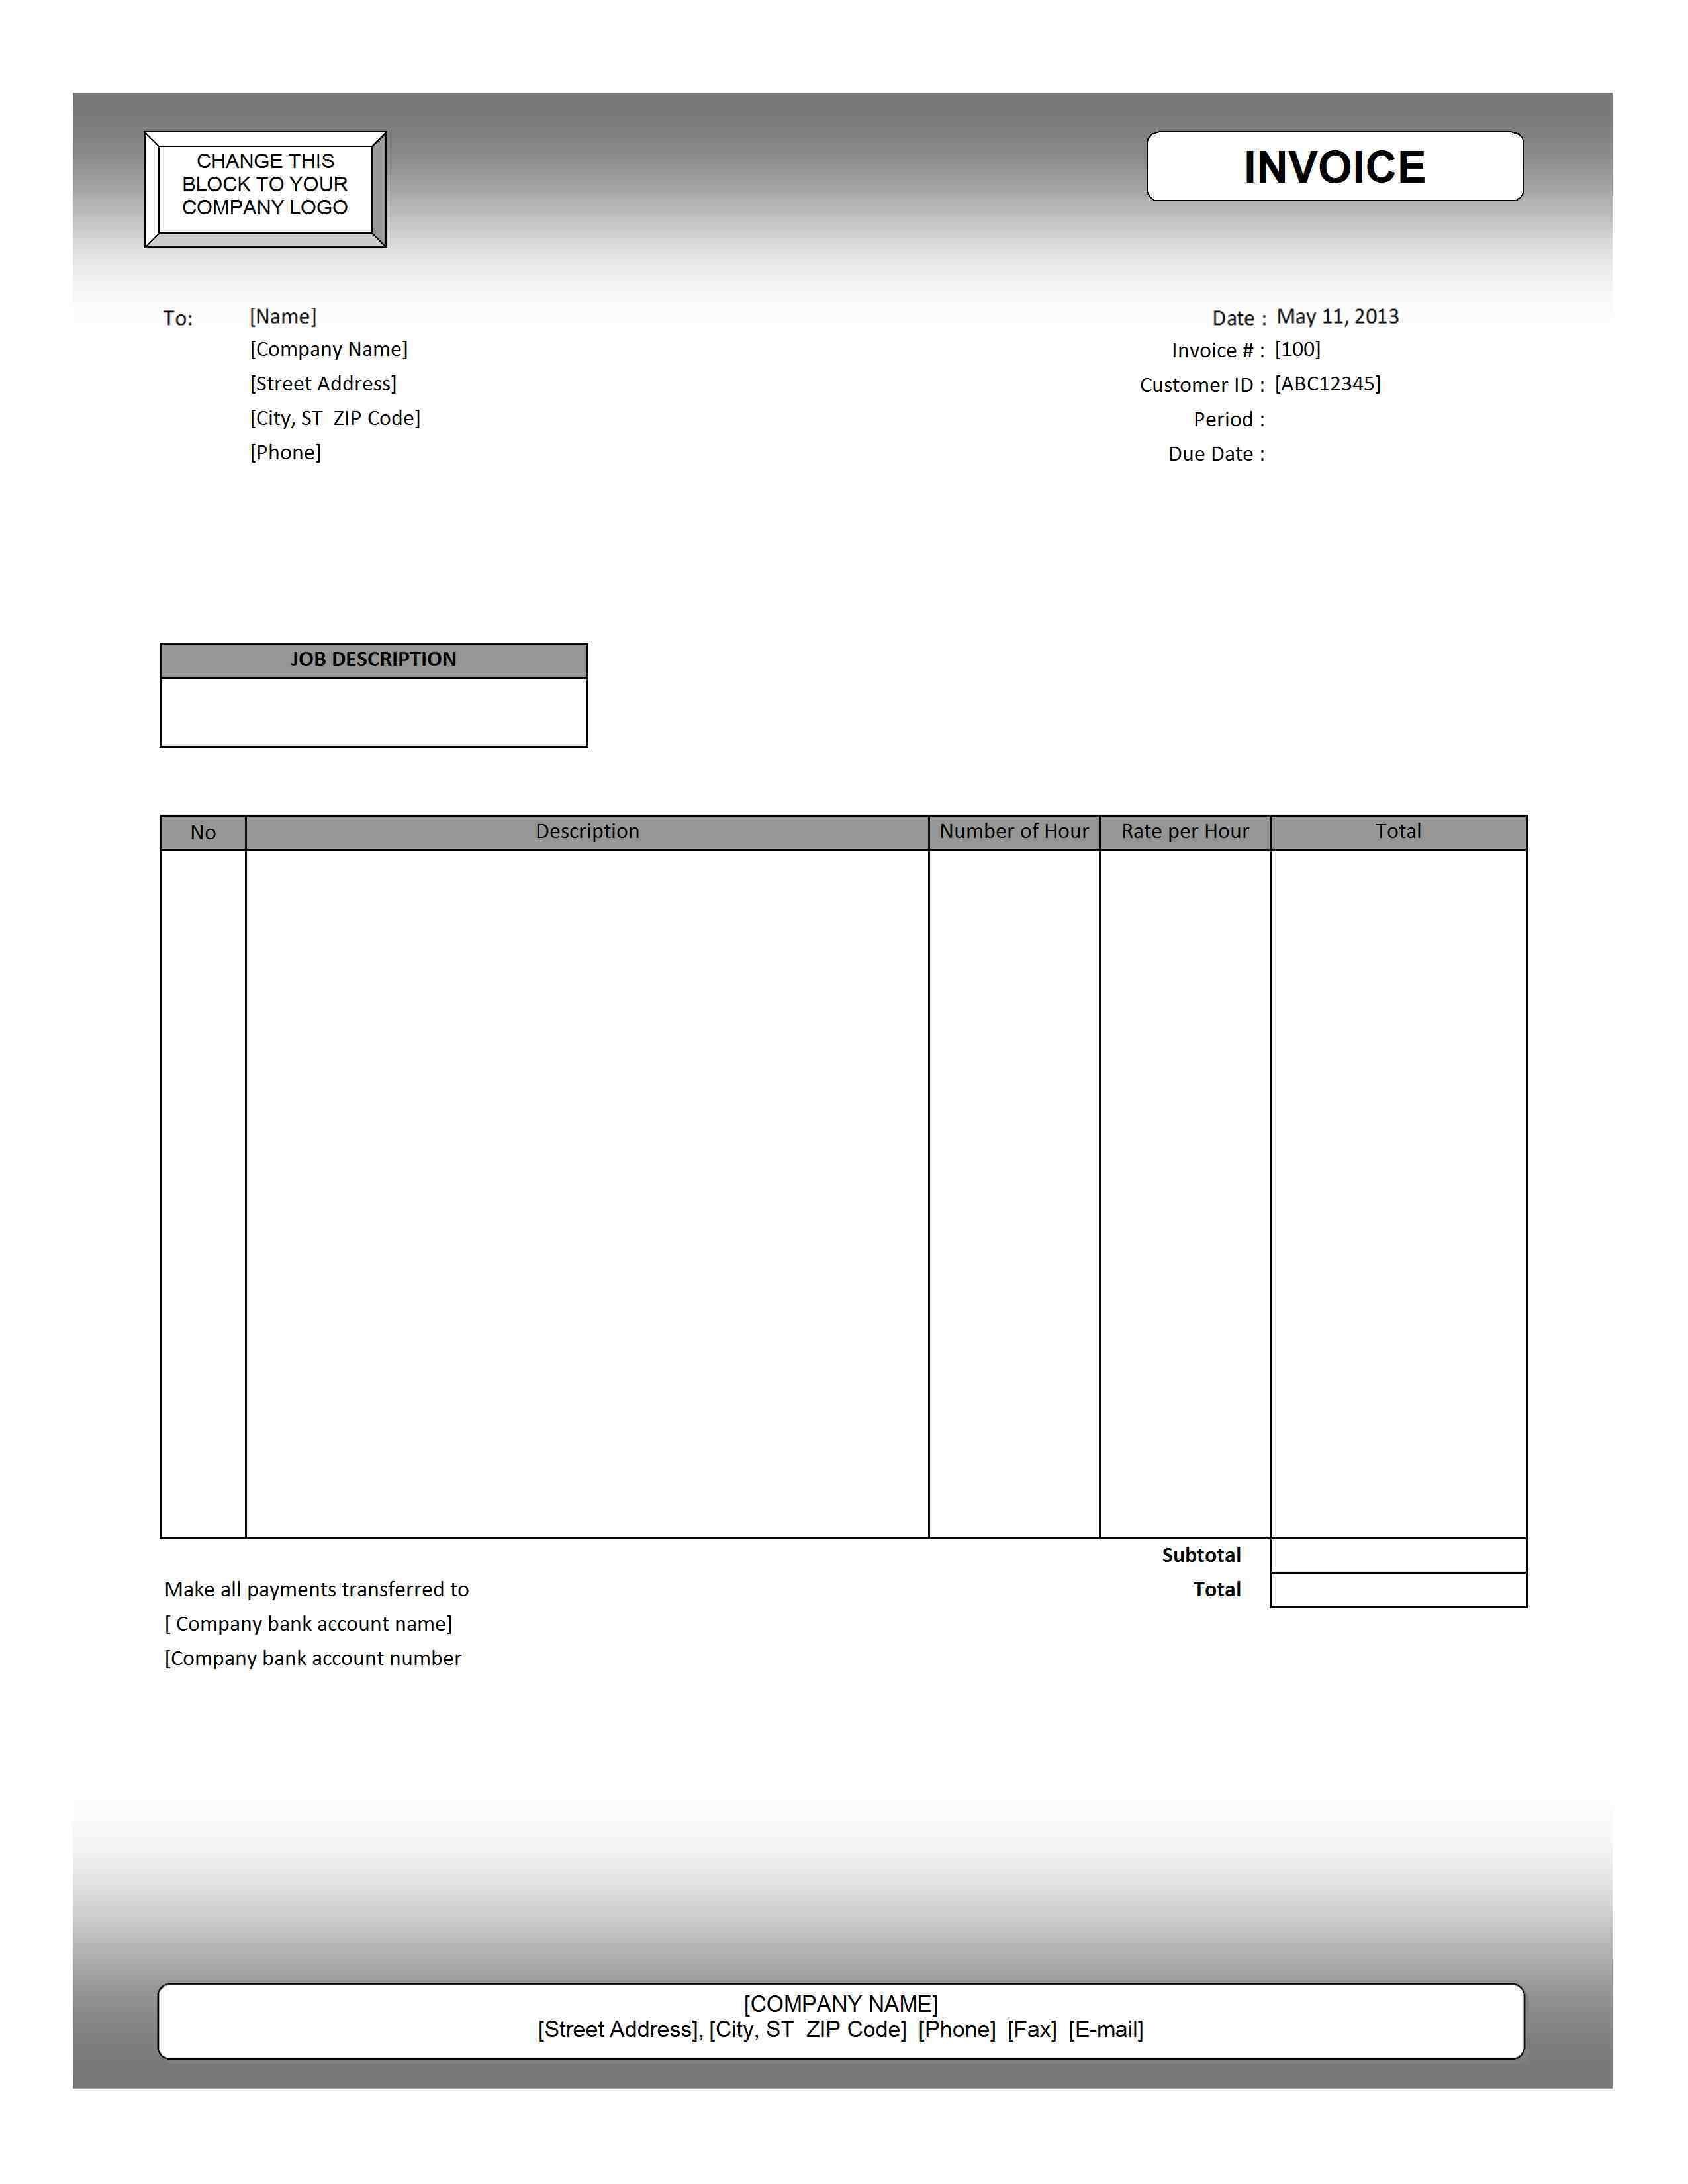 free invoice template google docs invoice template ideas. Black Bedroom Furniture Sets. Home Design Ideas